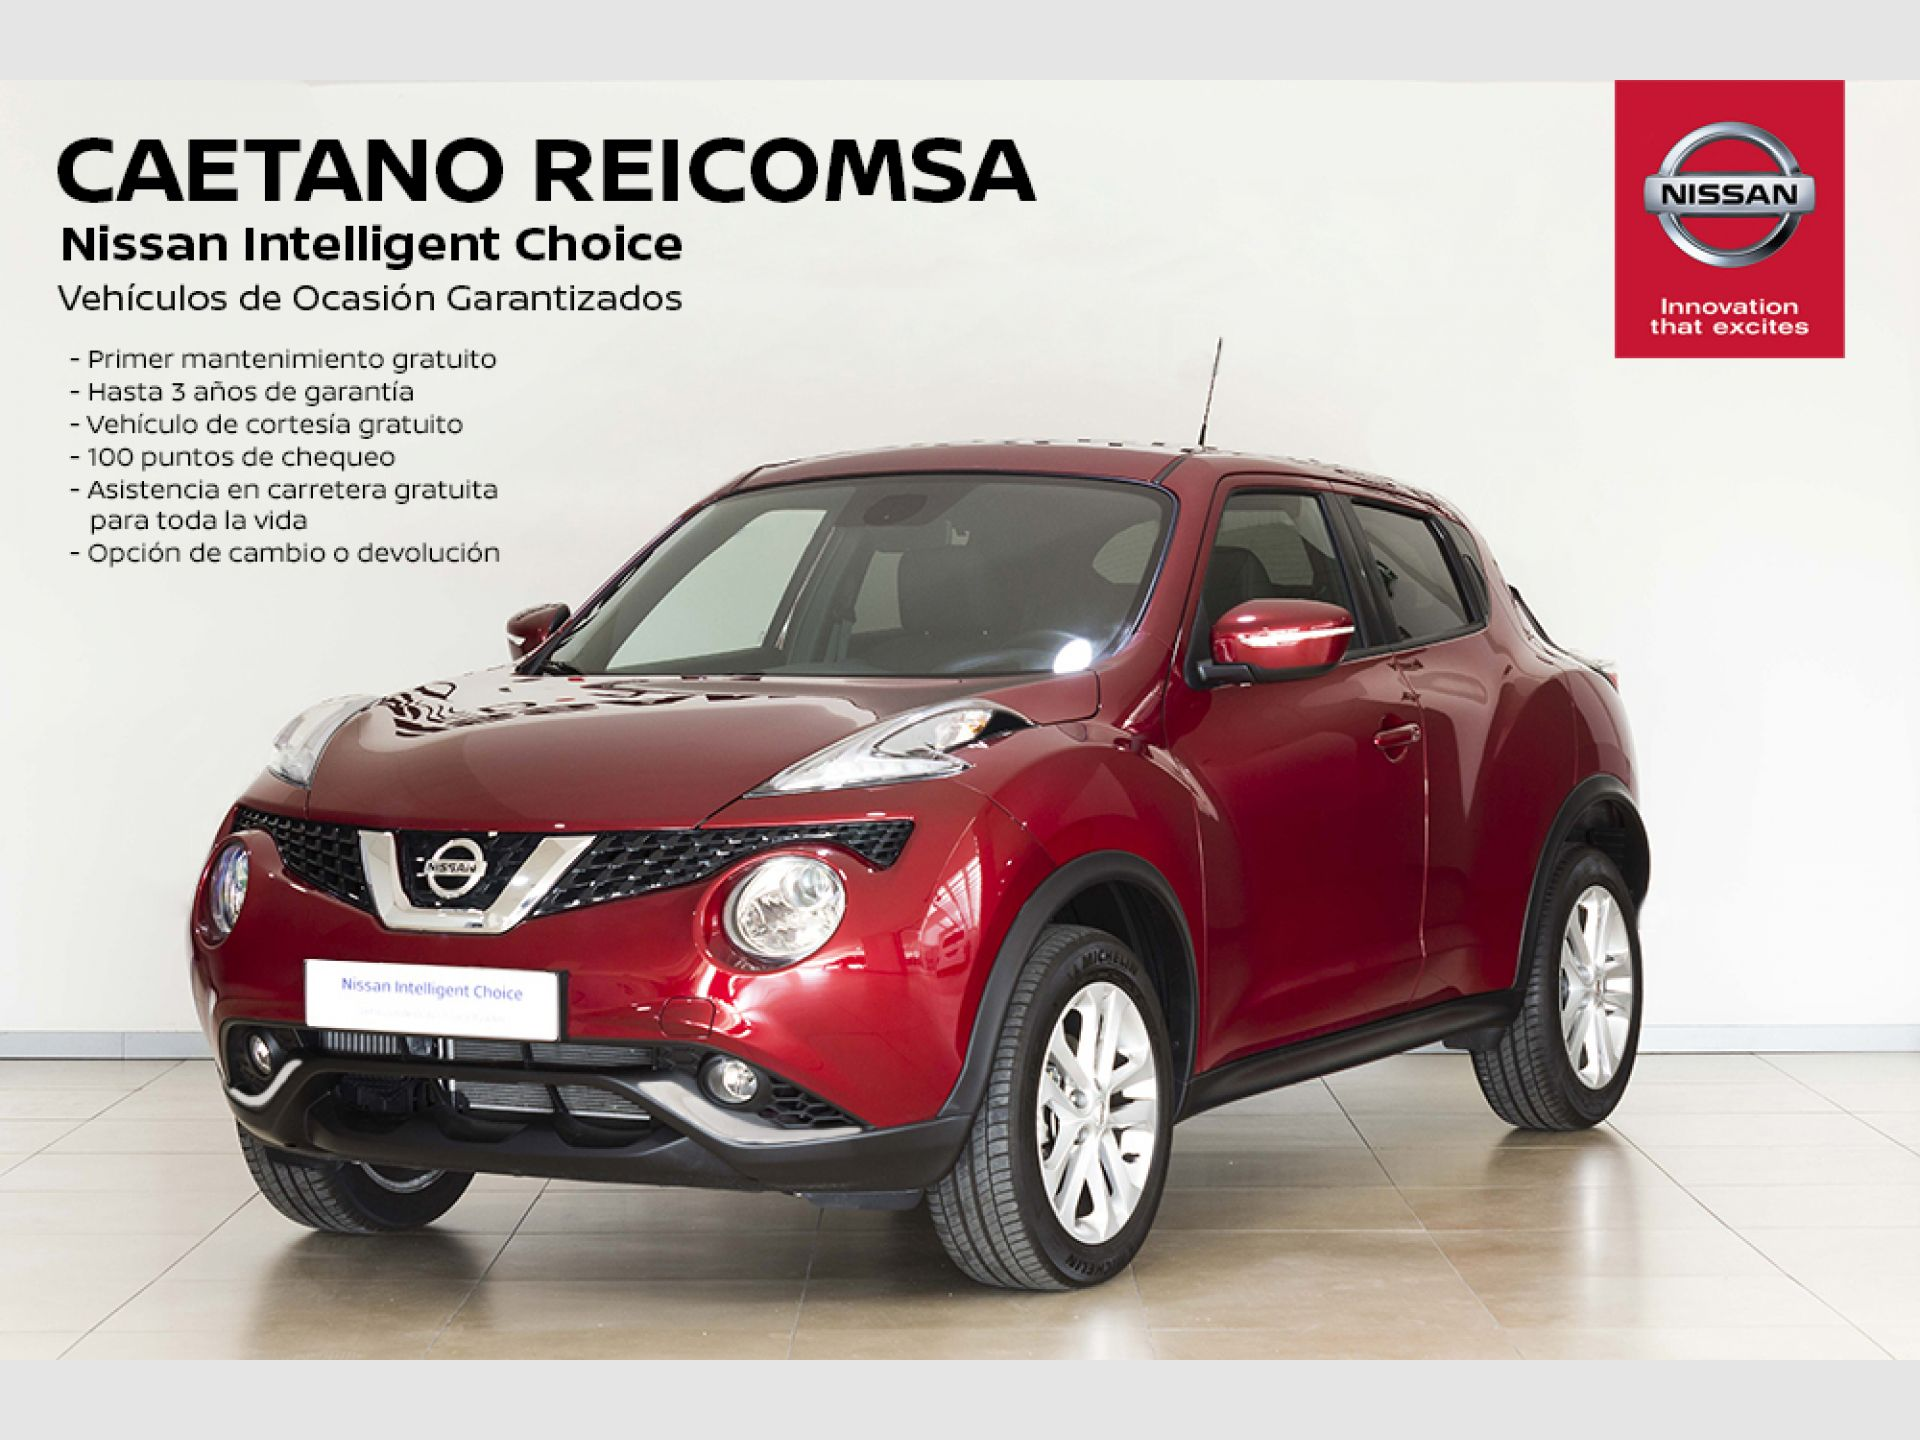 Nissan JUKE G EU6 86 kW (117 CV) XTRONIC N-CONNECTA + CROMADOS segunda mano Madrid